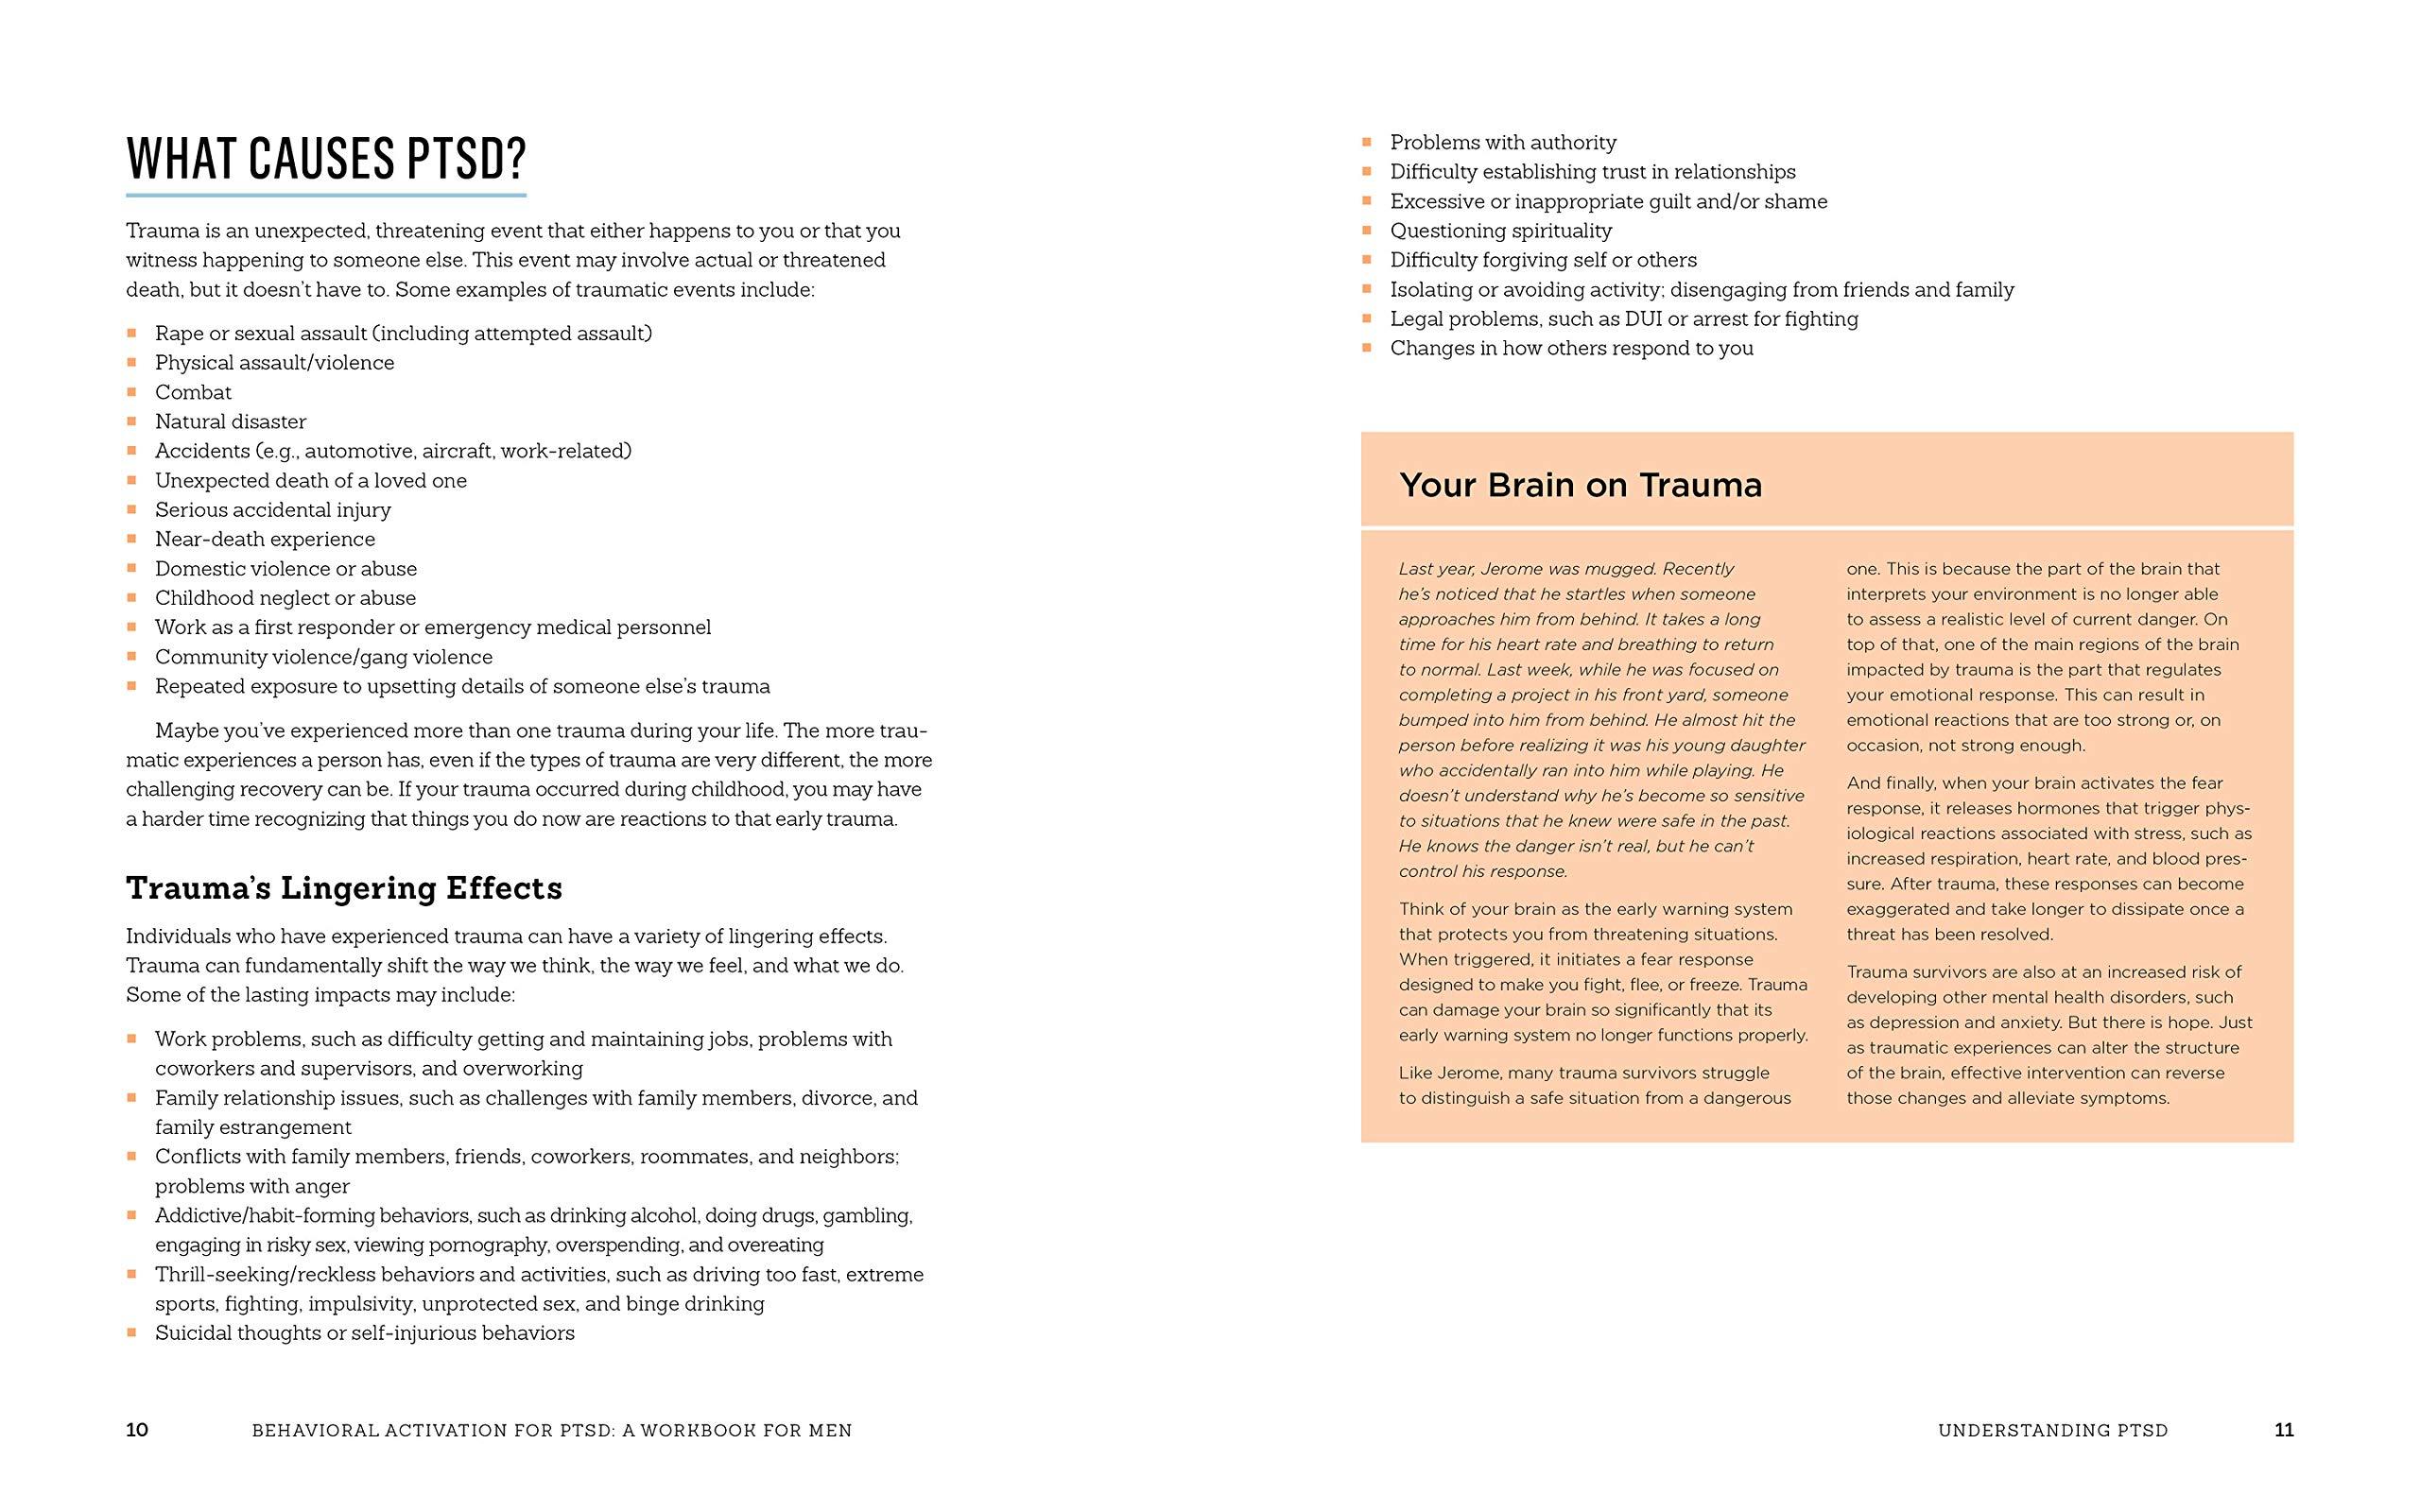 Behavioral Activation for PTSD: A Workbook for Men: Reduce